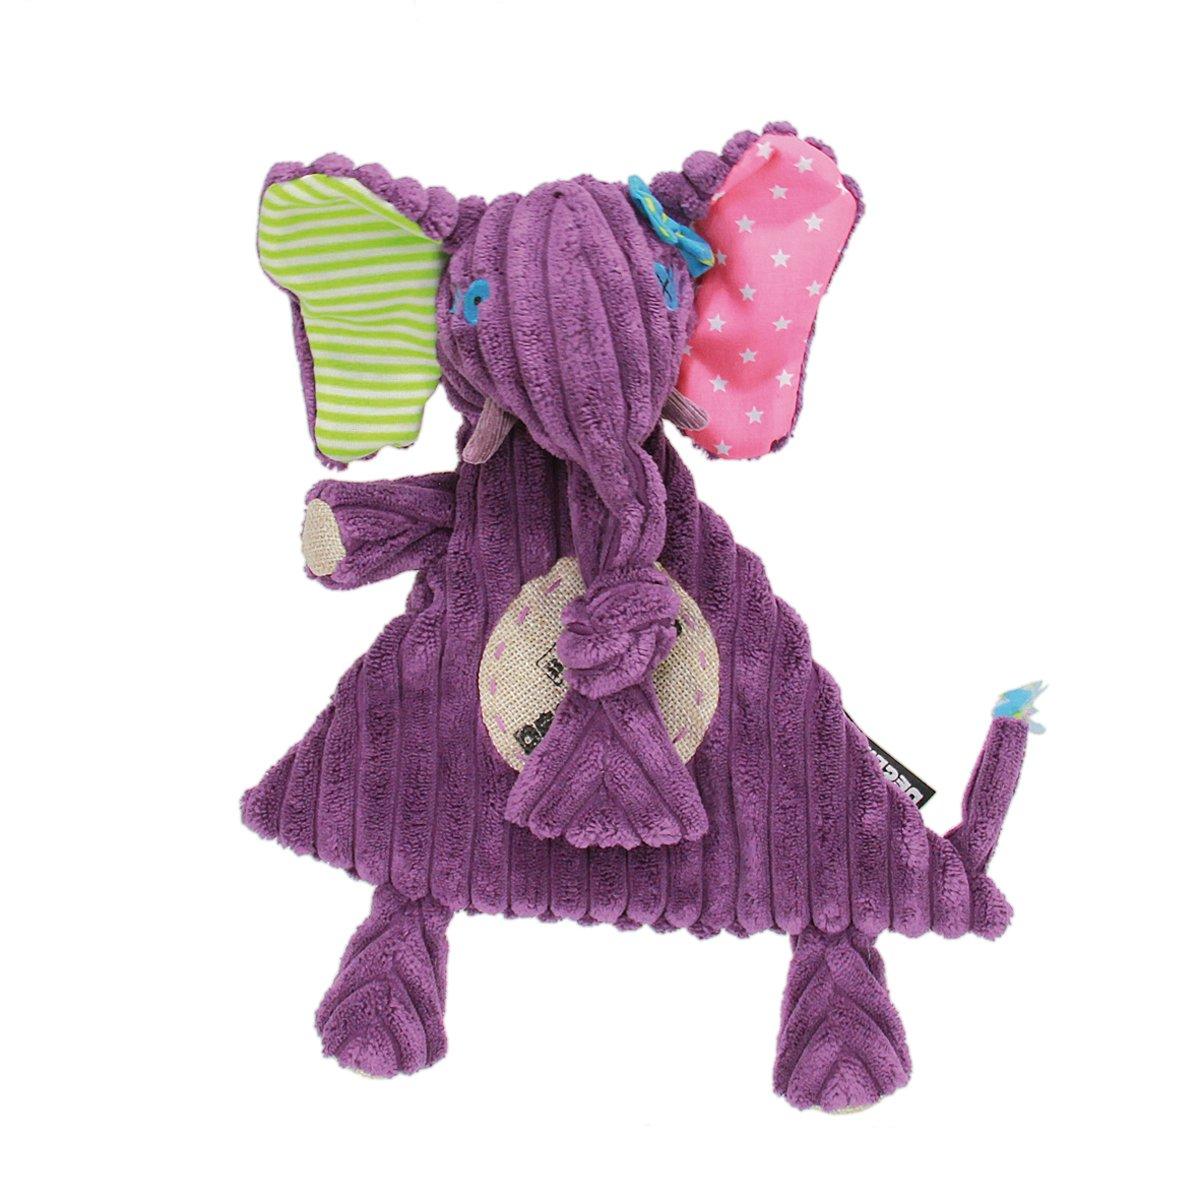 Déglingos- Sandykilos La Elefanta Animales Baby mantita, (36716)